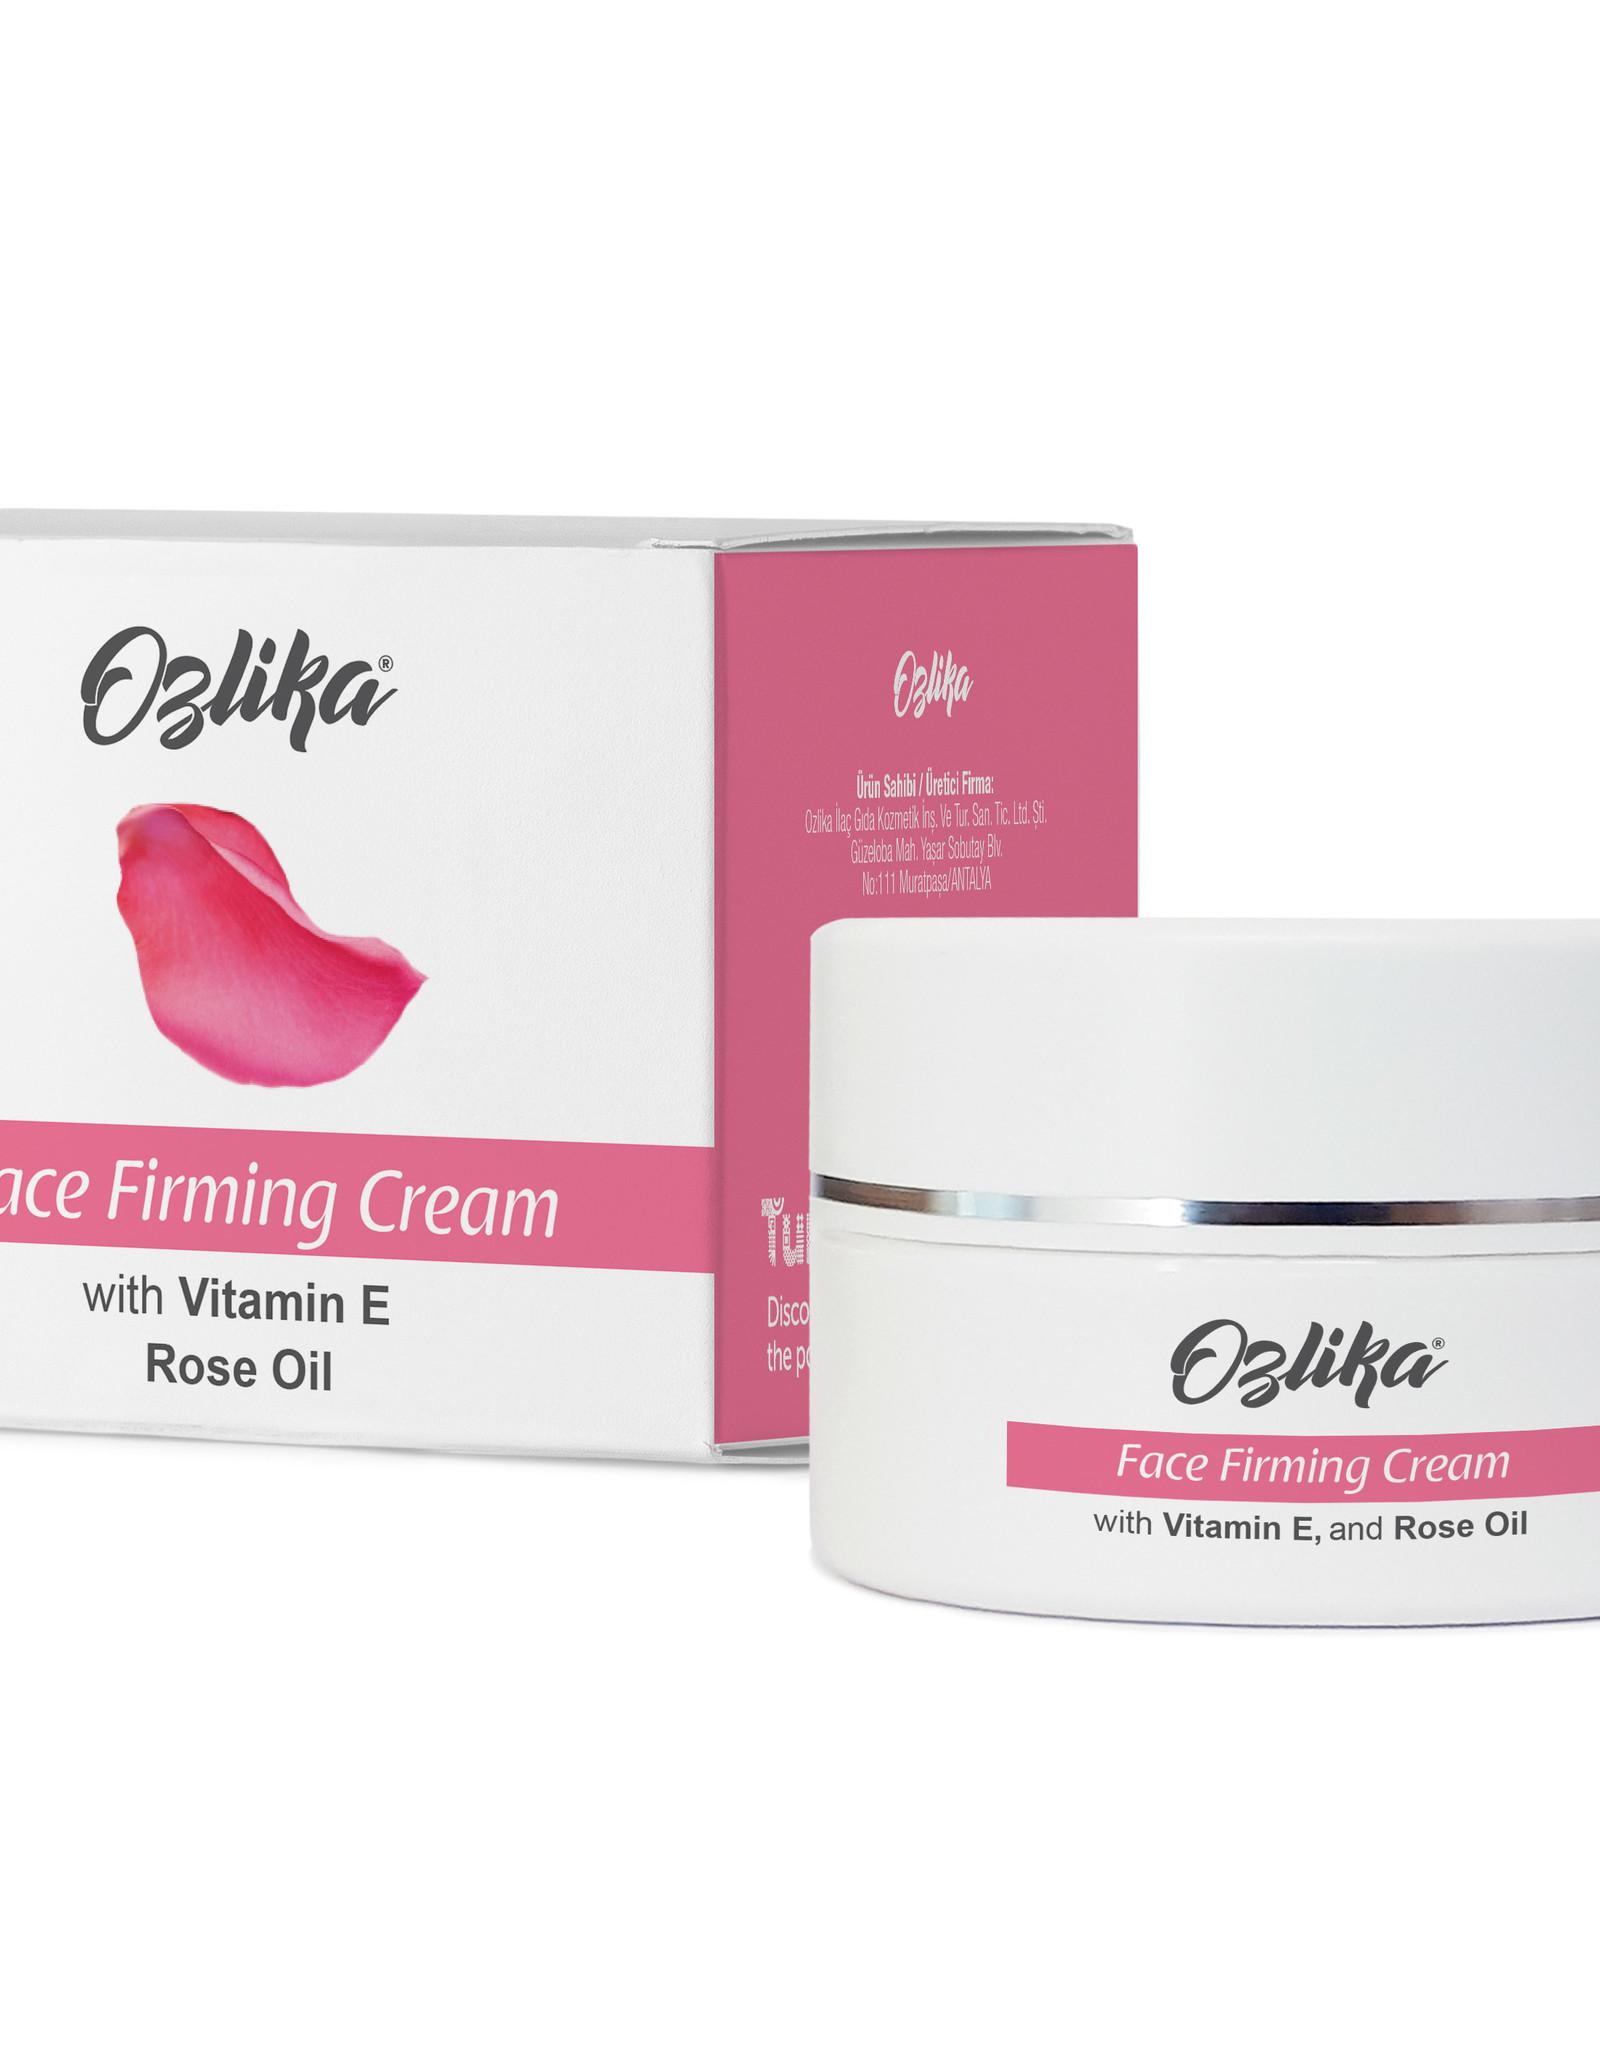 Özlika Ozlika Gezicht verstevigende crème (Face Firming Cream) 45ml